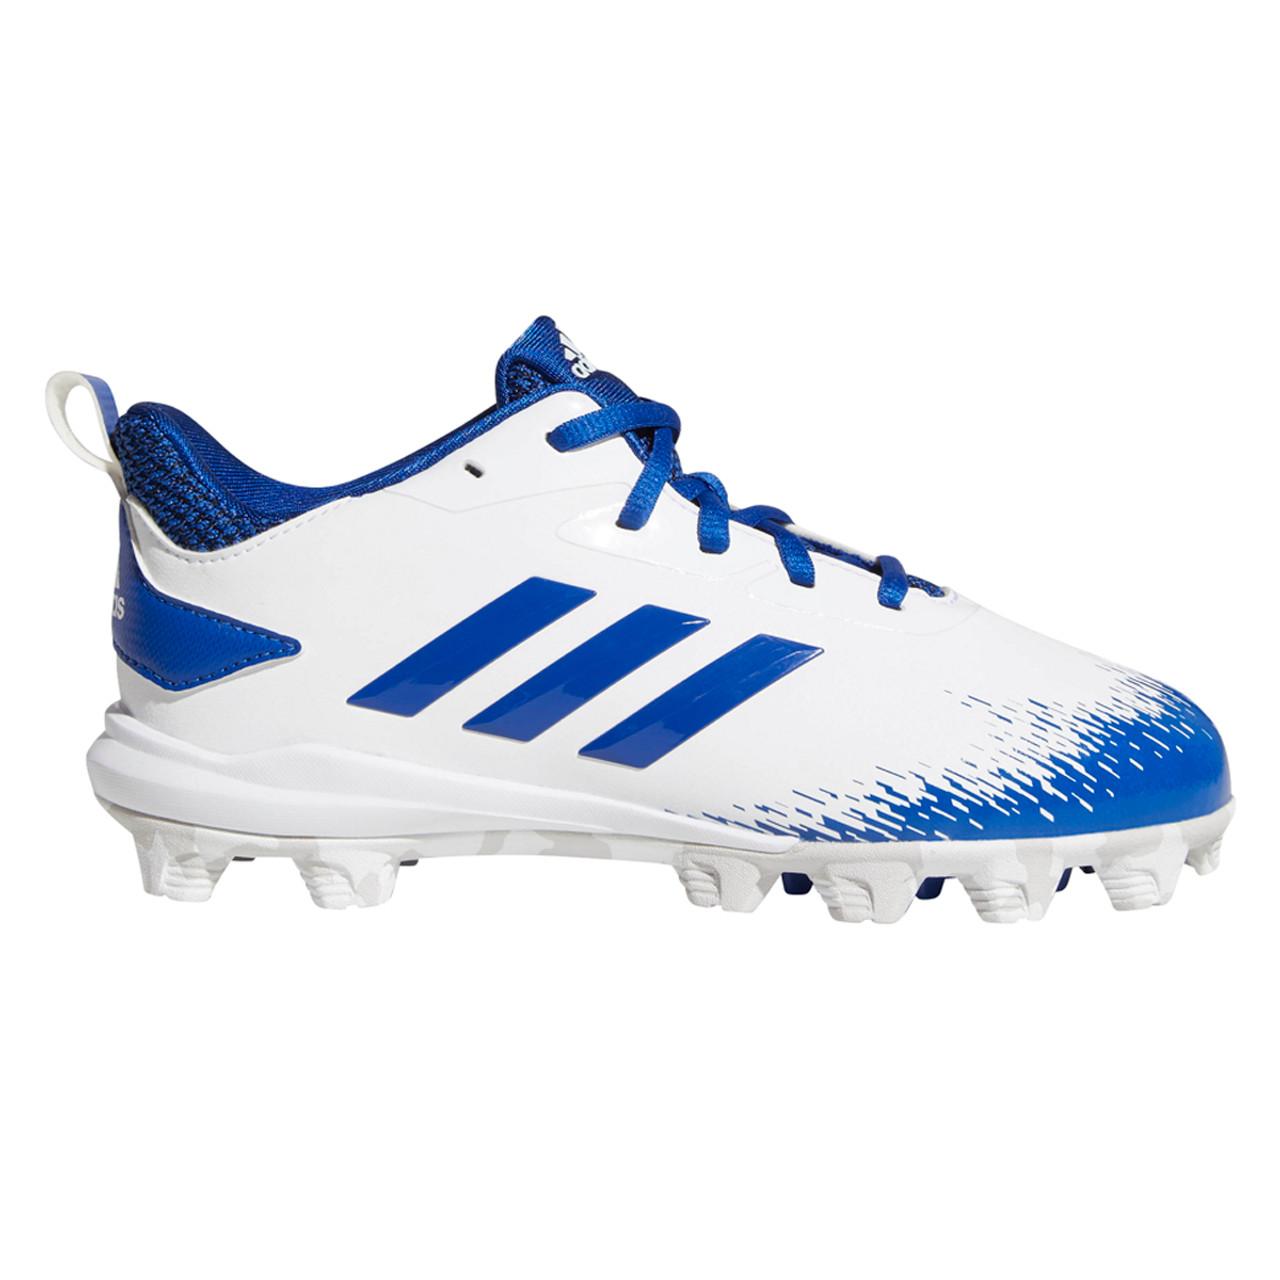 85c914cddec Adidas Adizero Afterburner V MD Youth Baseball Cleats CG5239 - White ...